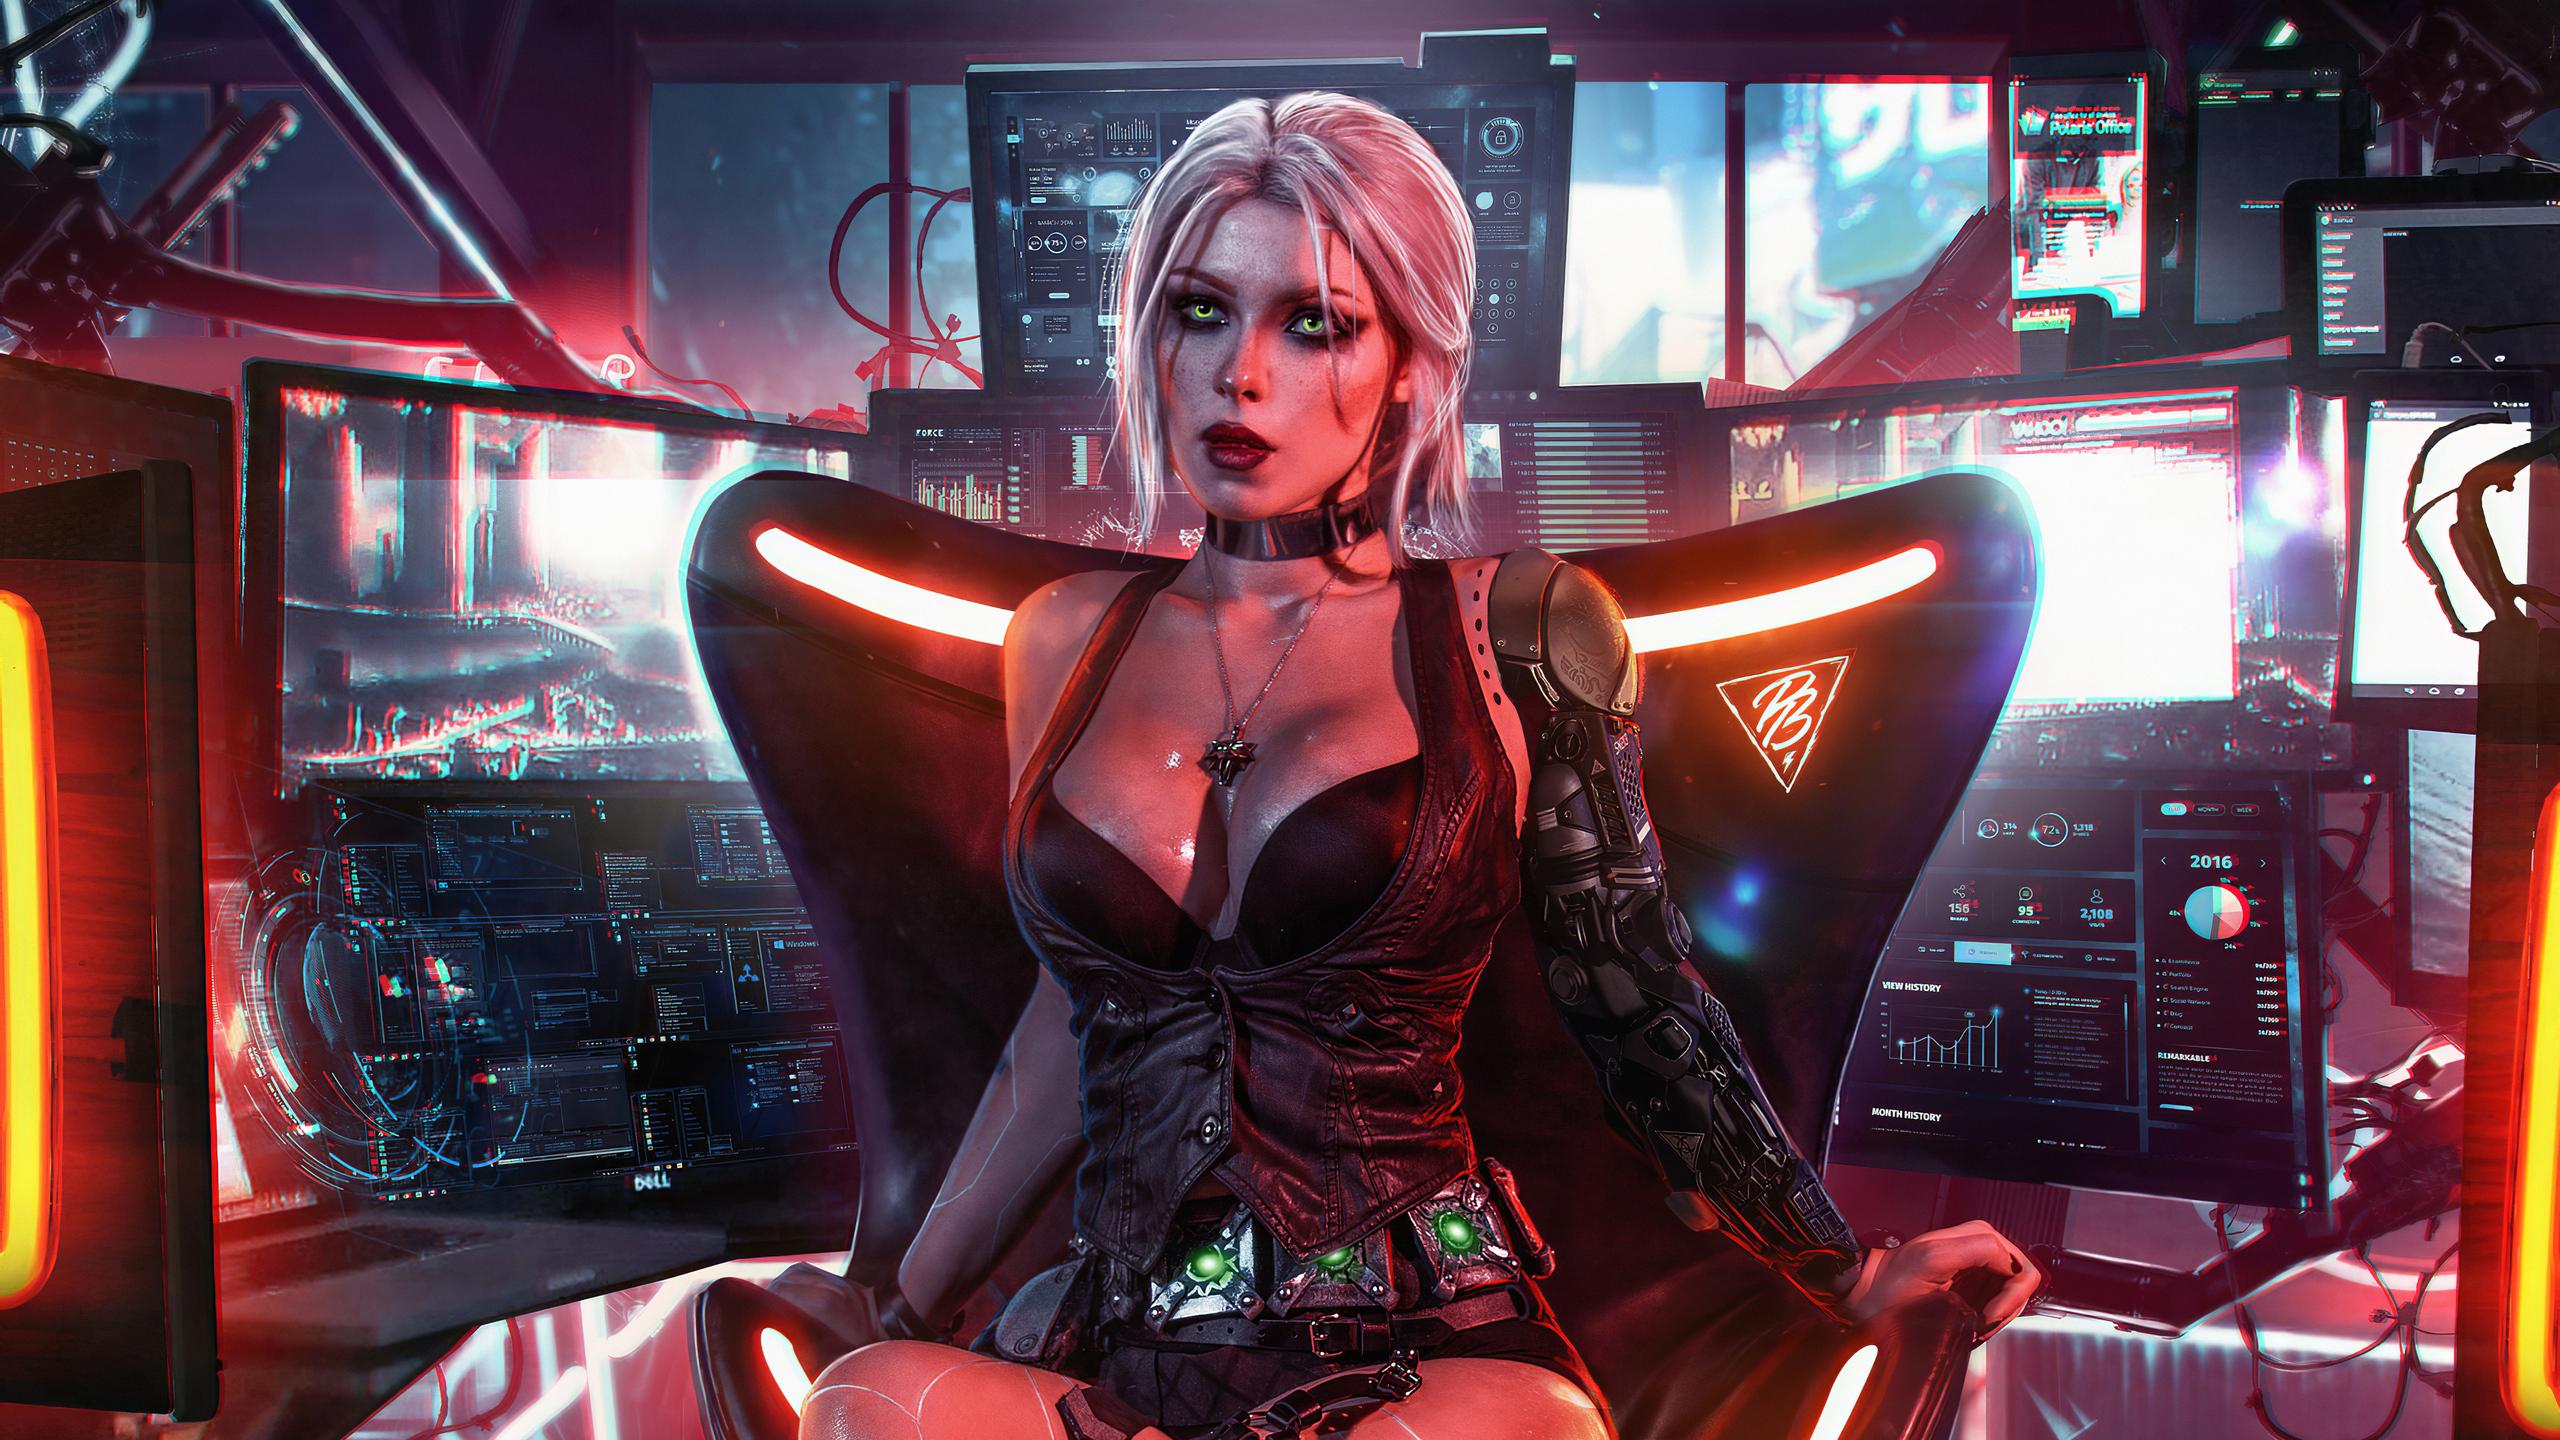 2560x1440 Cyberpunk 2077 4k Game 1440P Resolution HD 4k ...